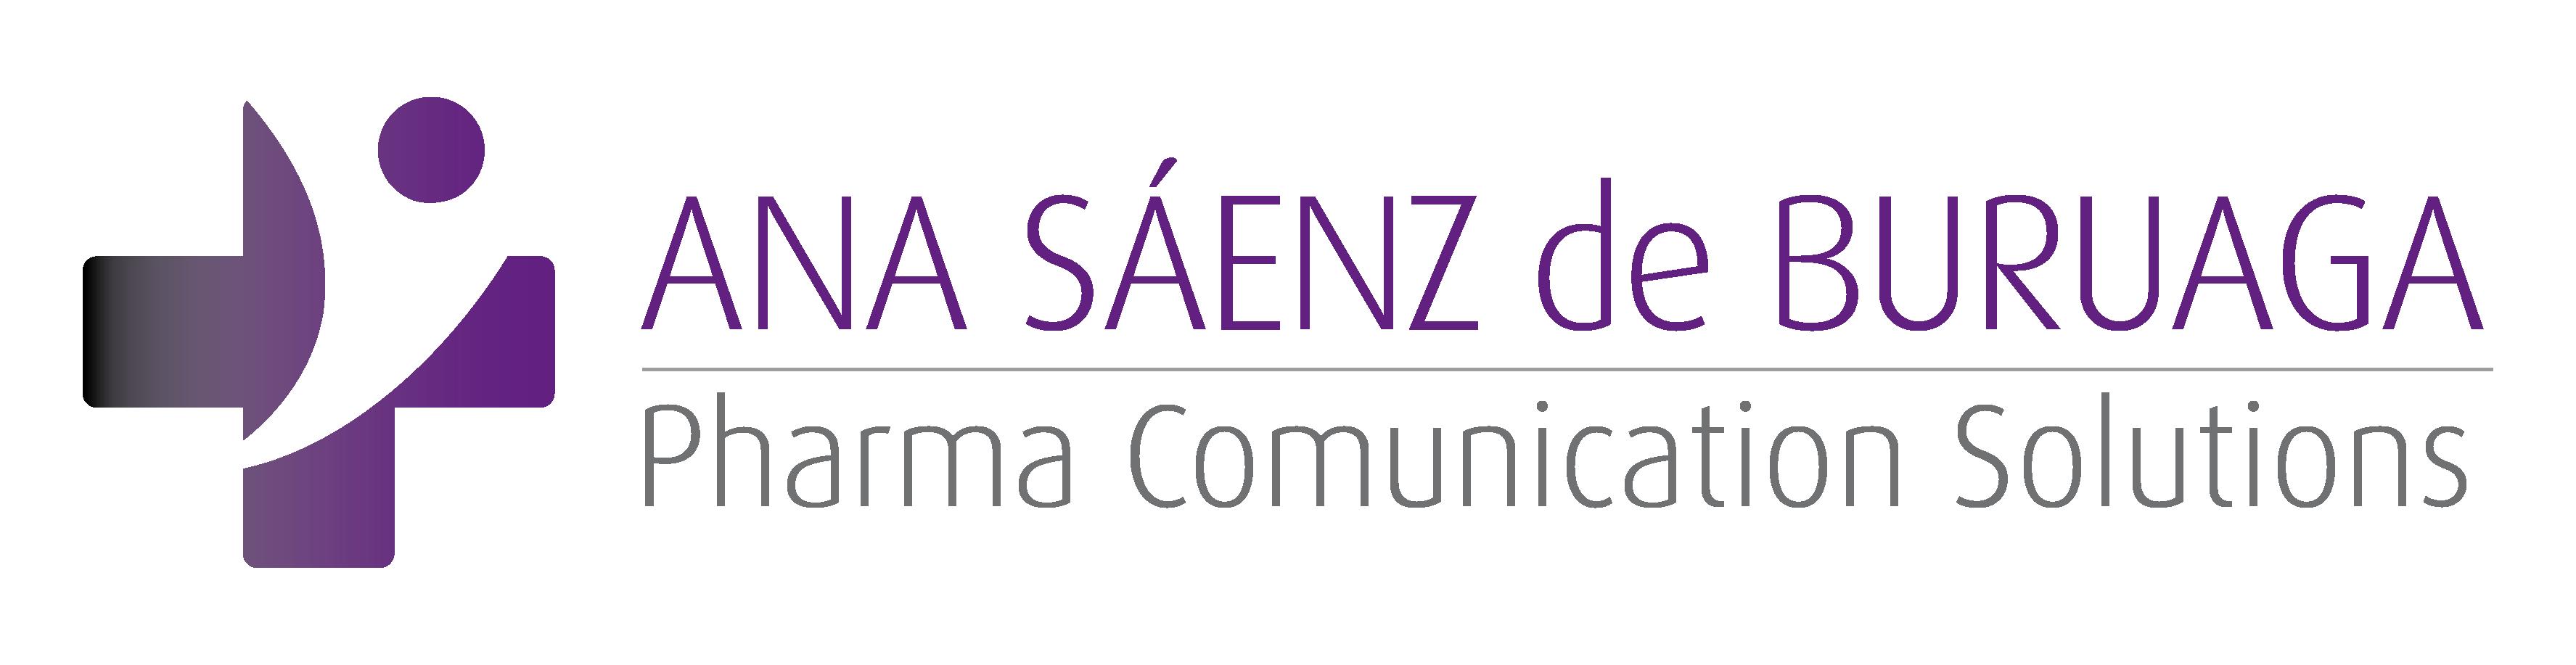 Ana Saenz de Buruaga